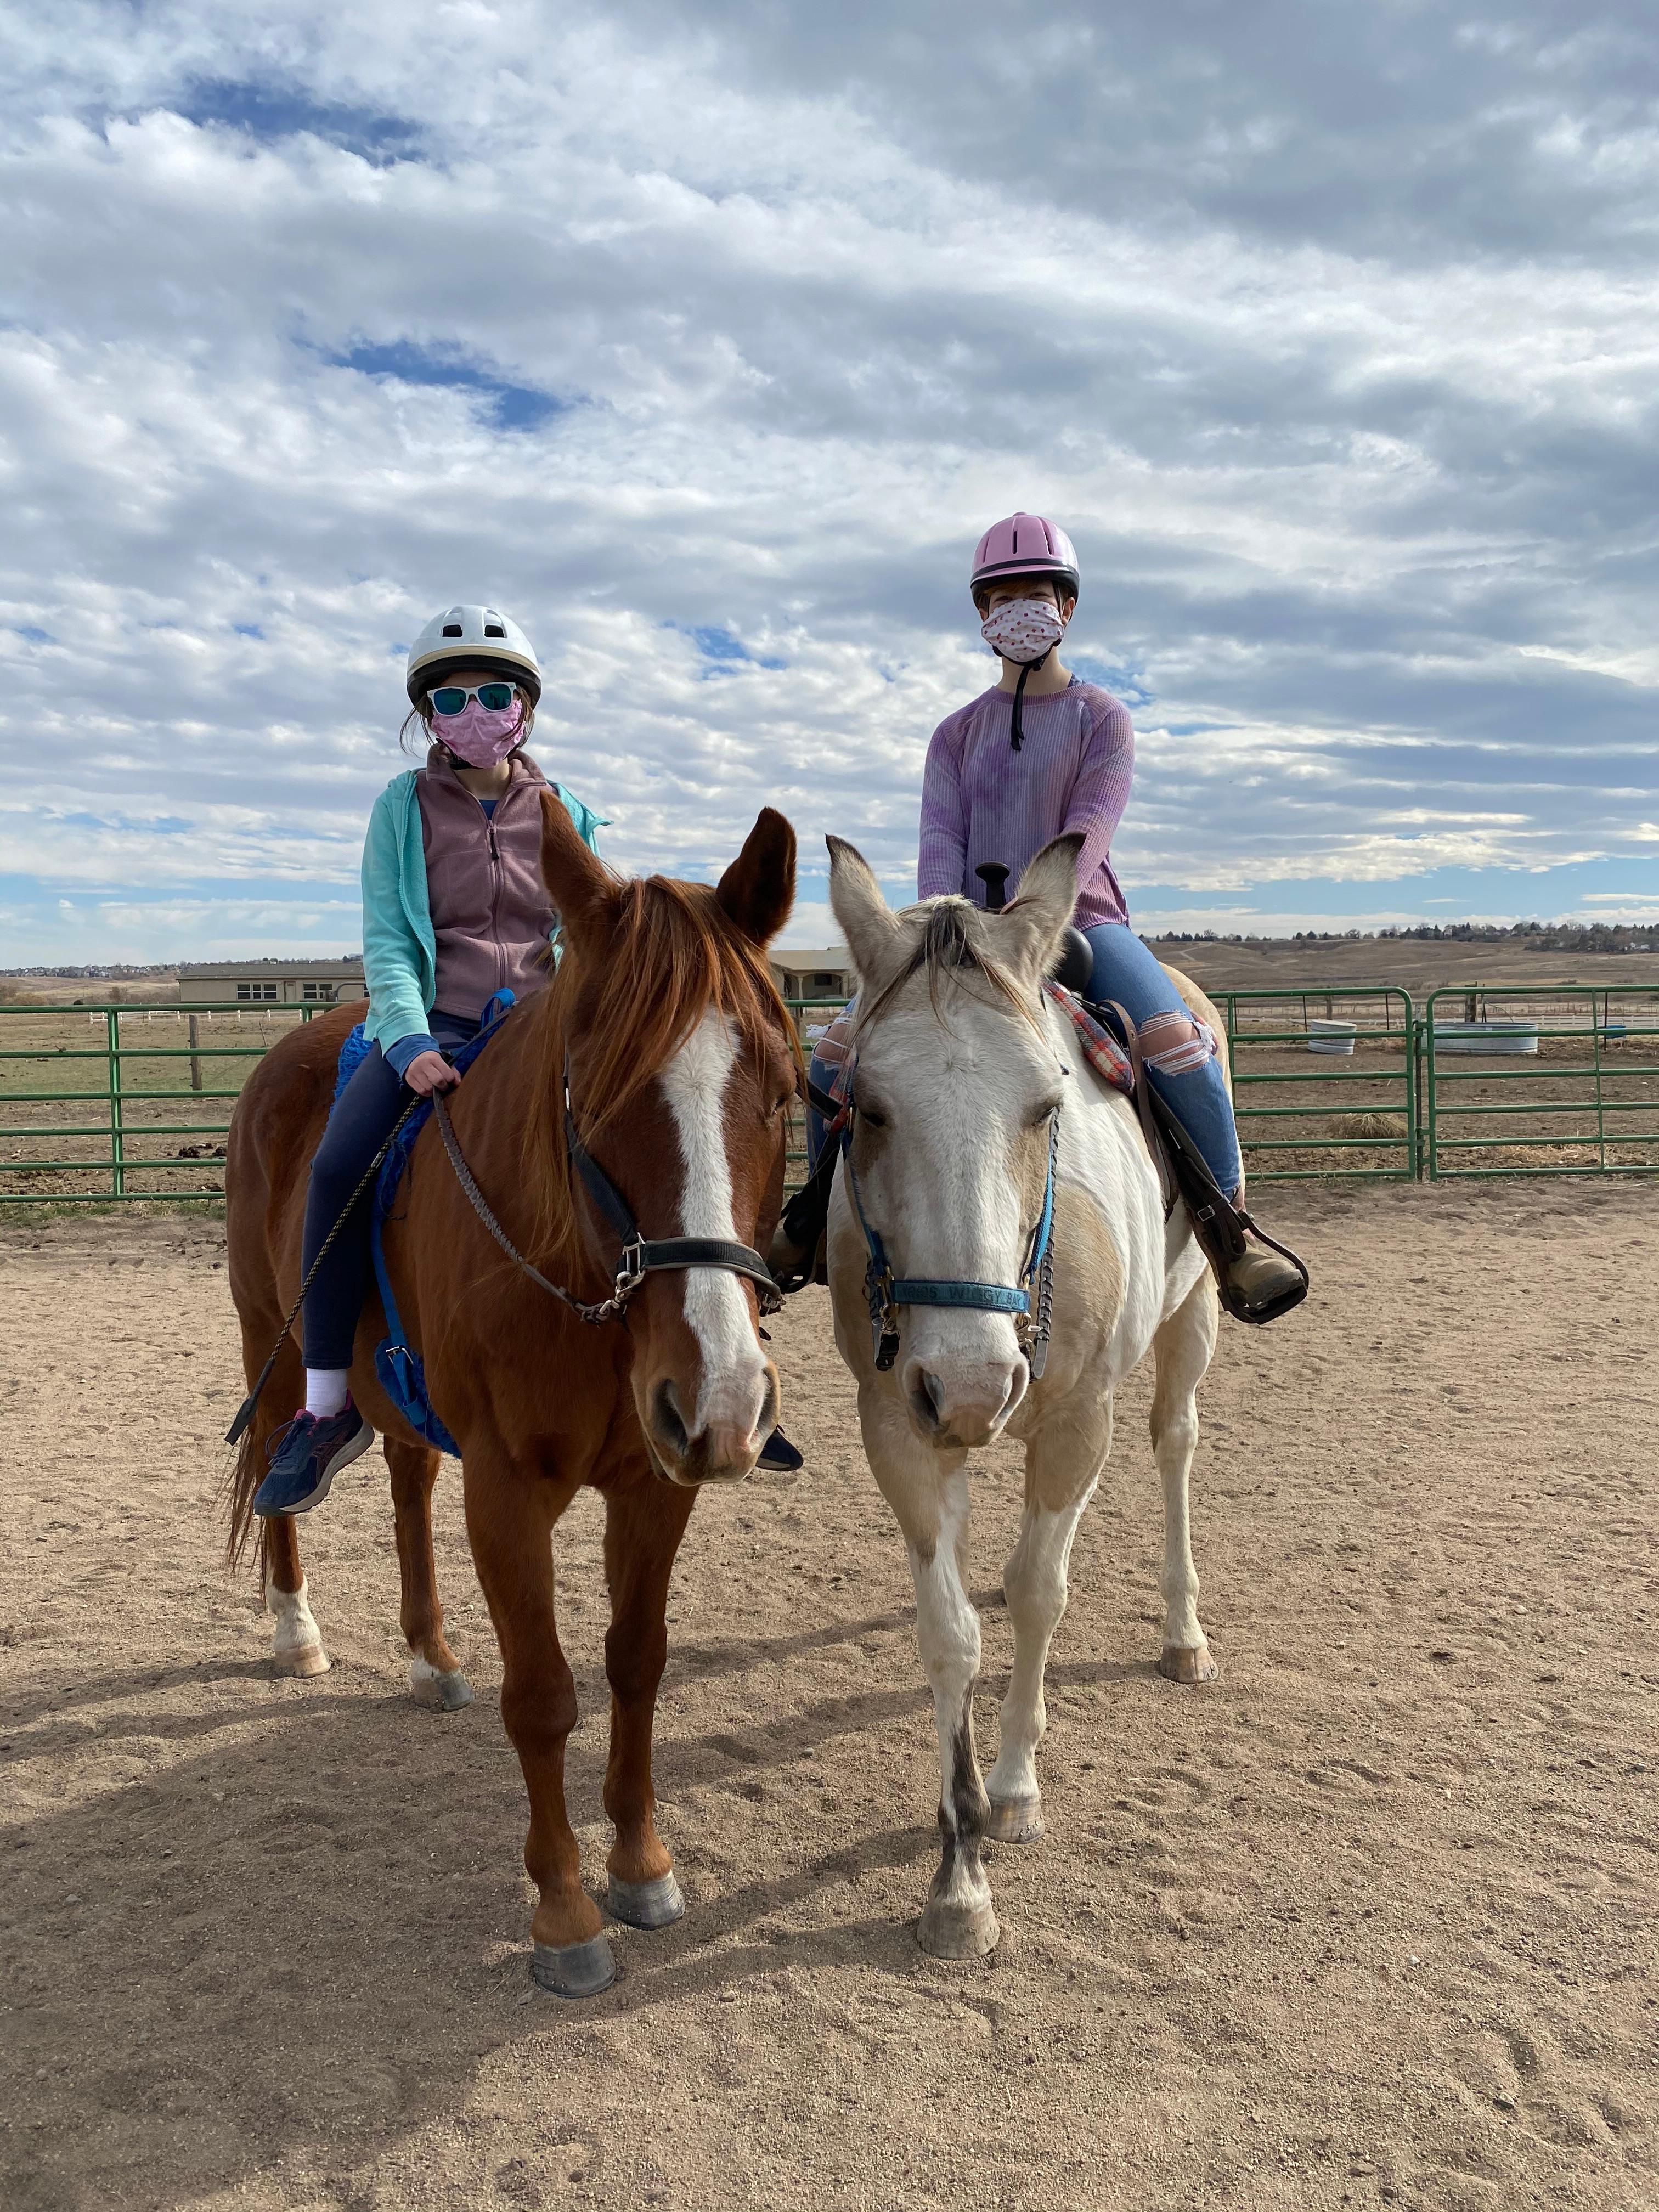 Horseplay-F2, 2021